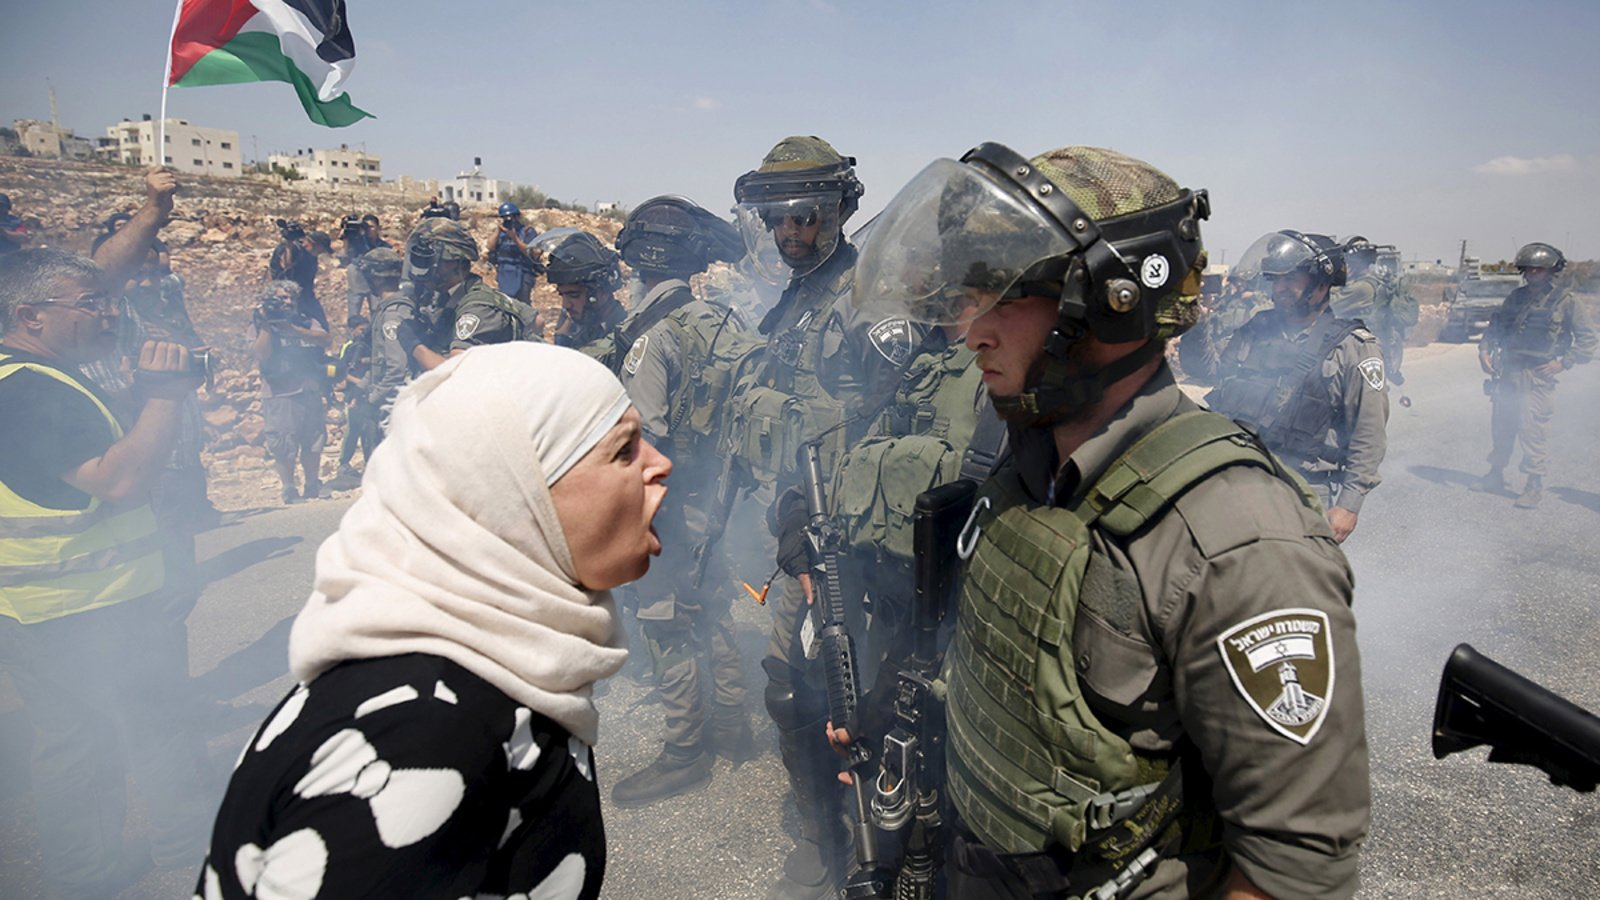 Rumahnya Diserang Gas Air Mata, Seorang Wanita Palestina Alami Keguguran